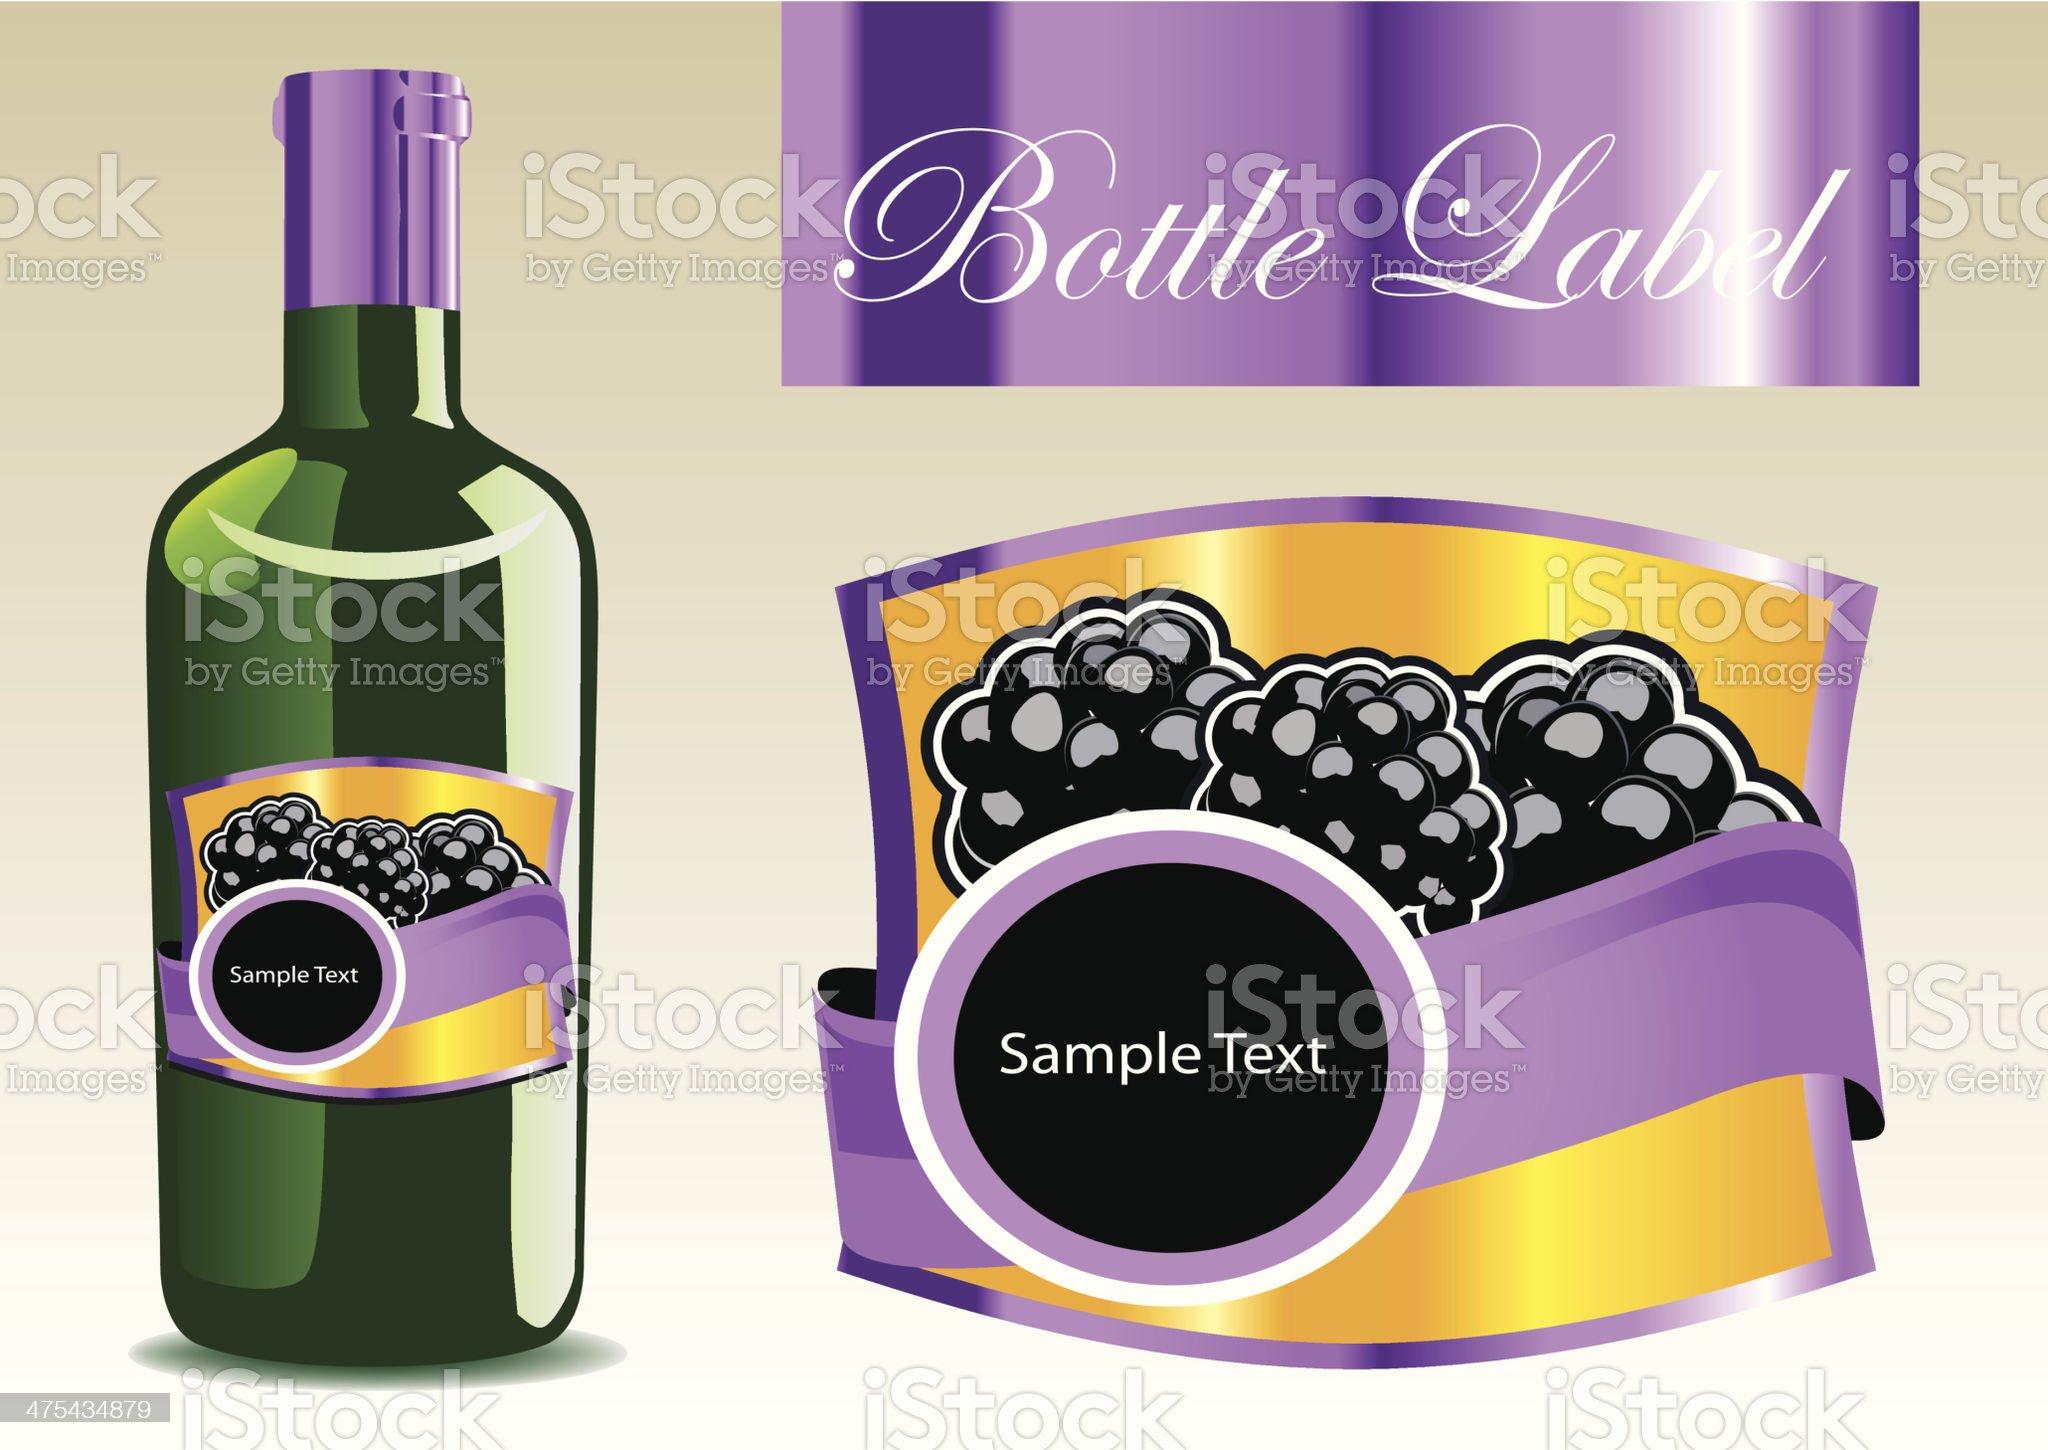 label for bottle royalty-free stock vector art